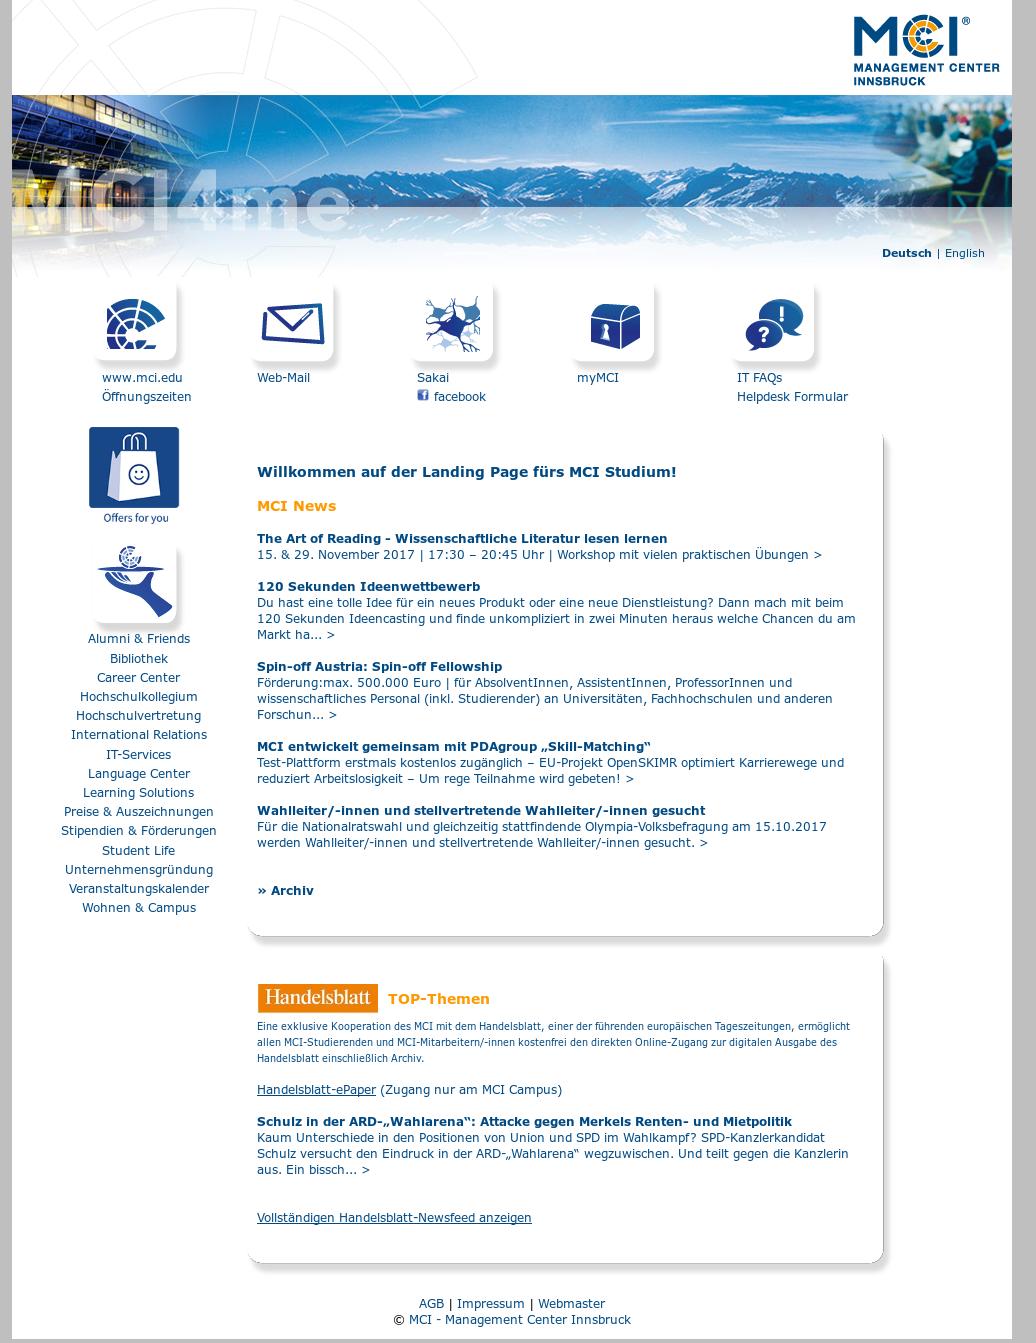 Mci4Me's website screenshot on Sep 2017